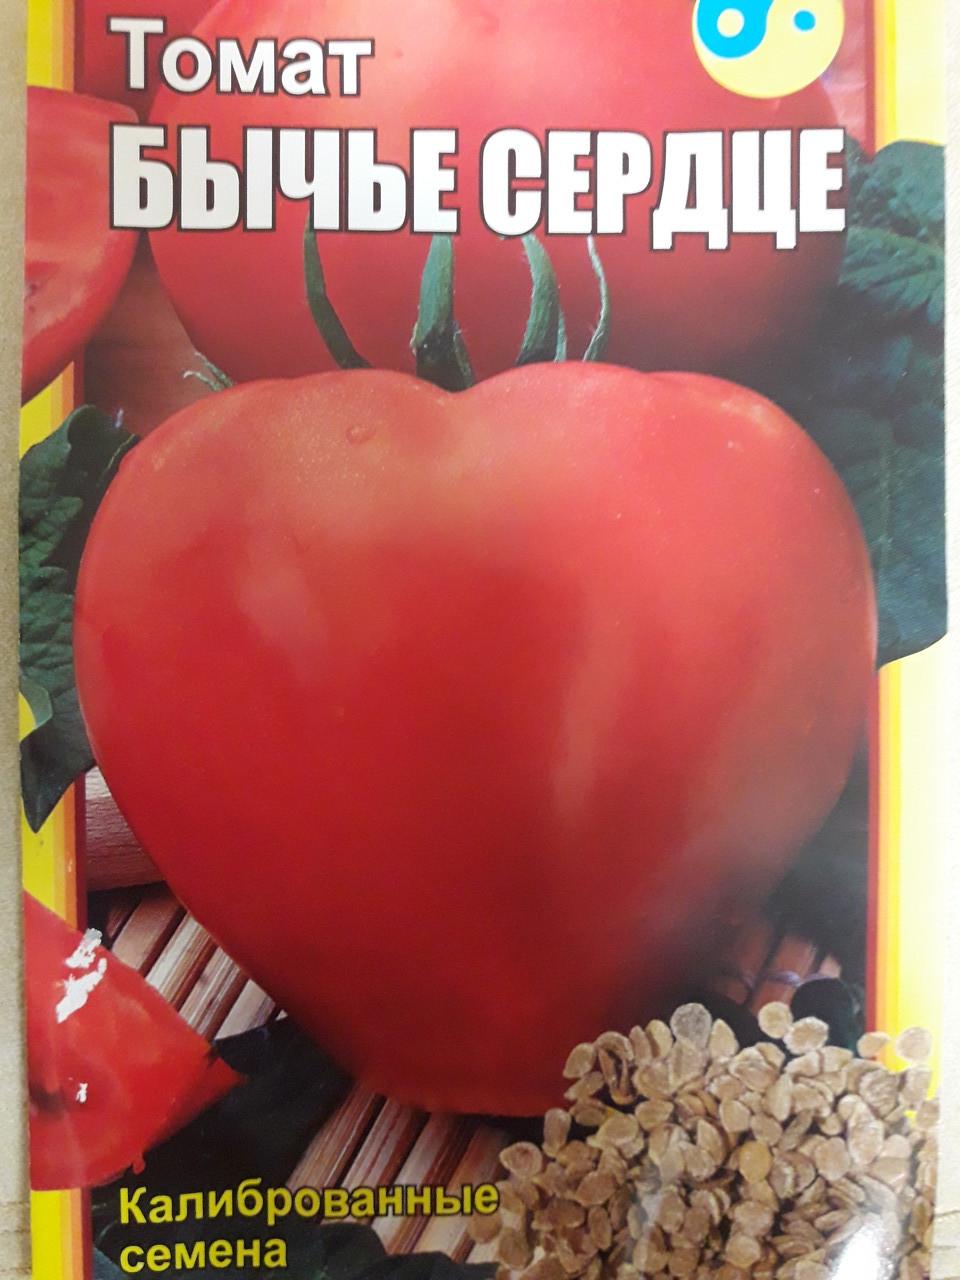 Семена томат Бычье сердце